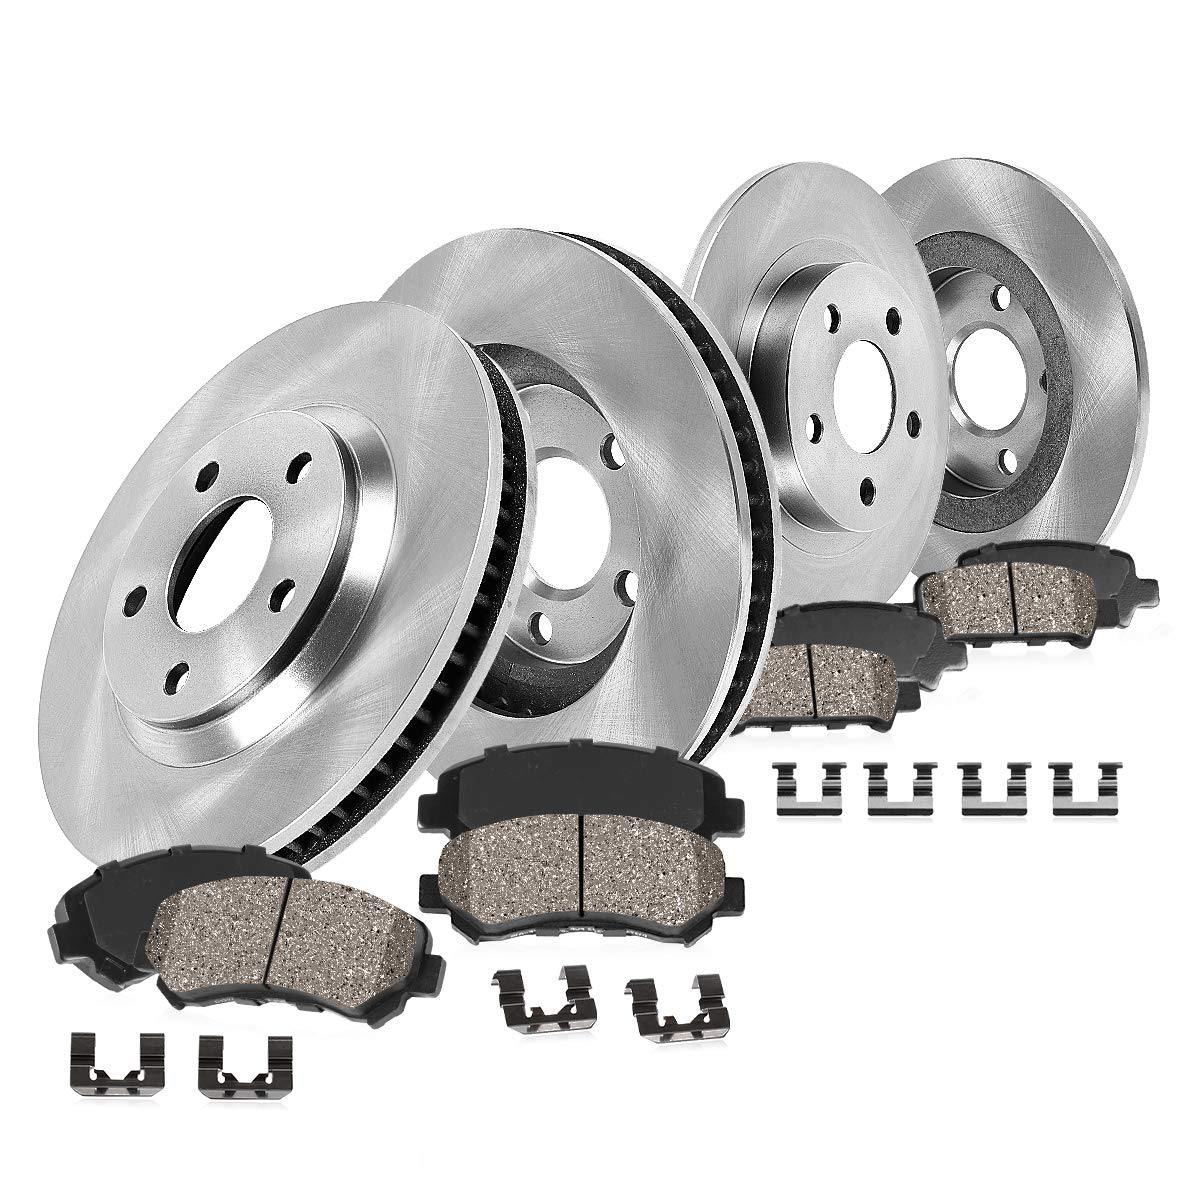 Amazon.com: Callahan CRK02085 FRONT + REAR Premium Brake Rotors + Ceramic Pads + Hardware [for Kia Optima EX SX Limited Turbo 2.0L]: Automotive